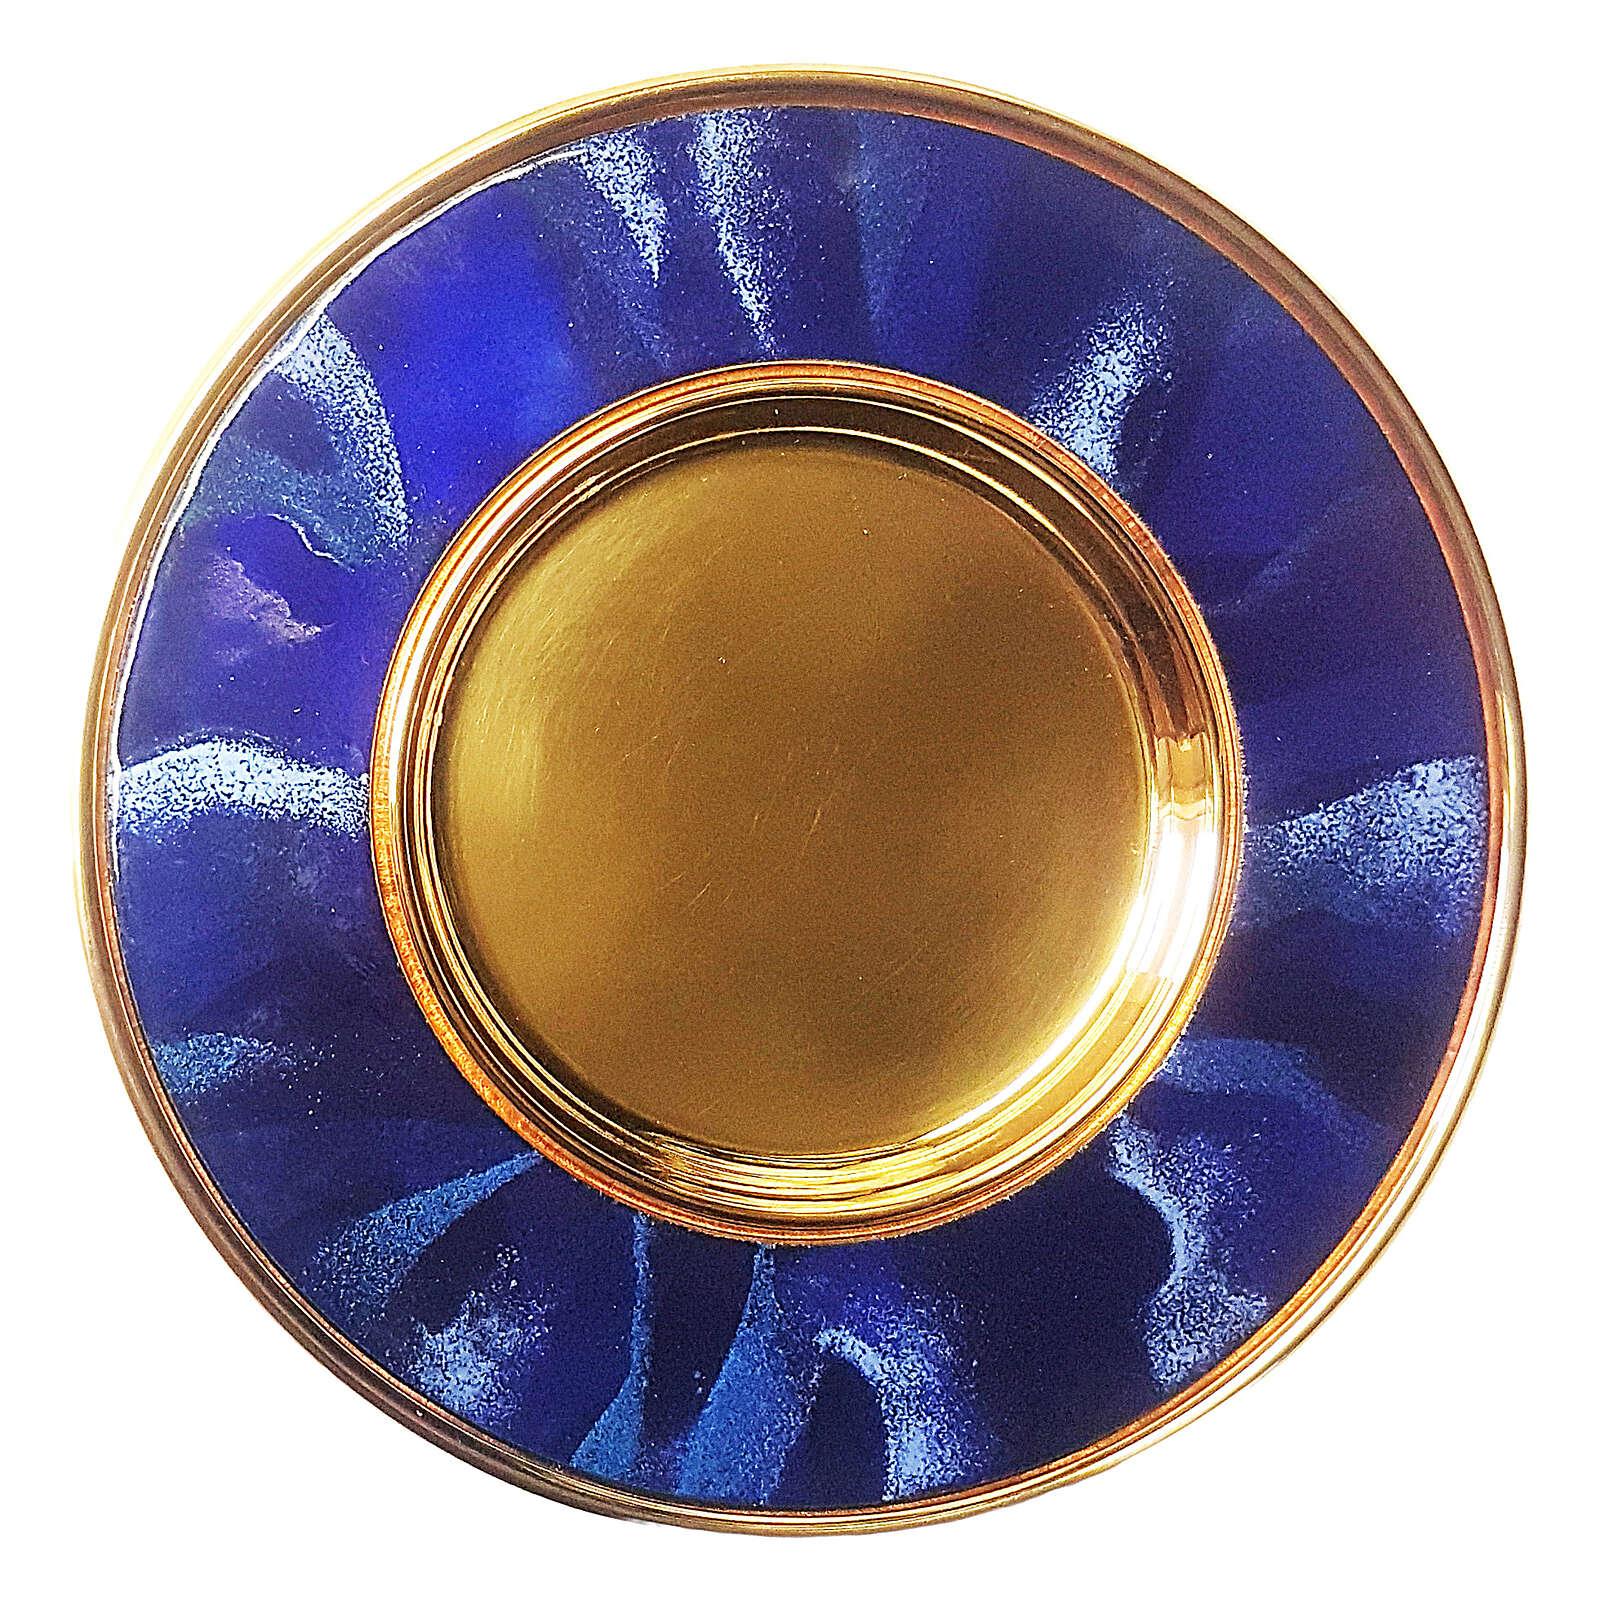 Blue enamelled paten gold plated brass 6 in 4